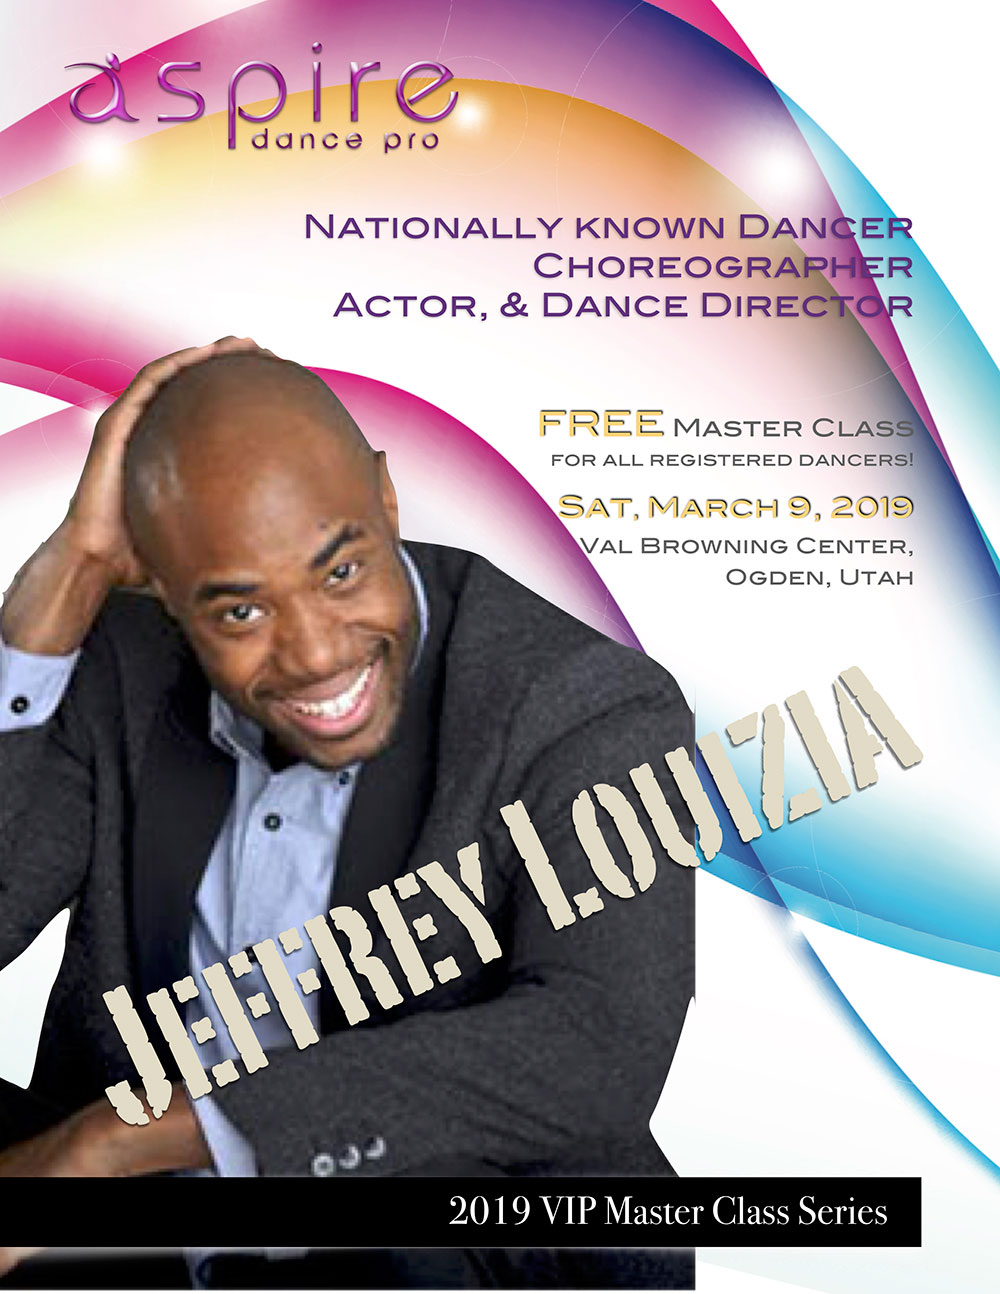 Jeffrey Louizia - Aspire Dance Pro Competitions Masterclass Instructor